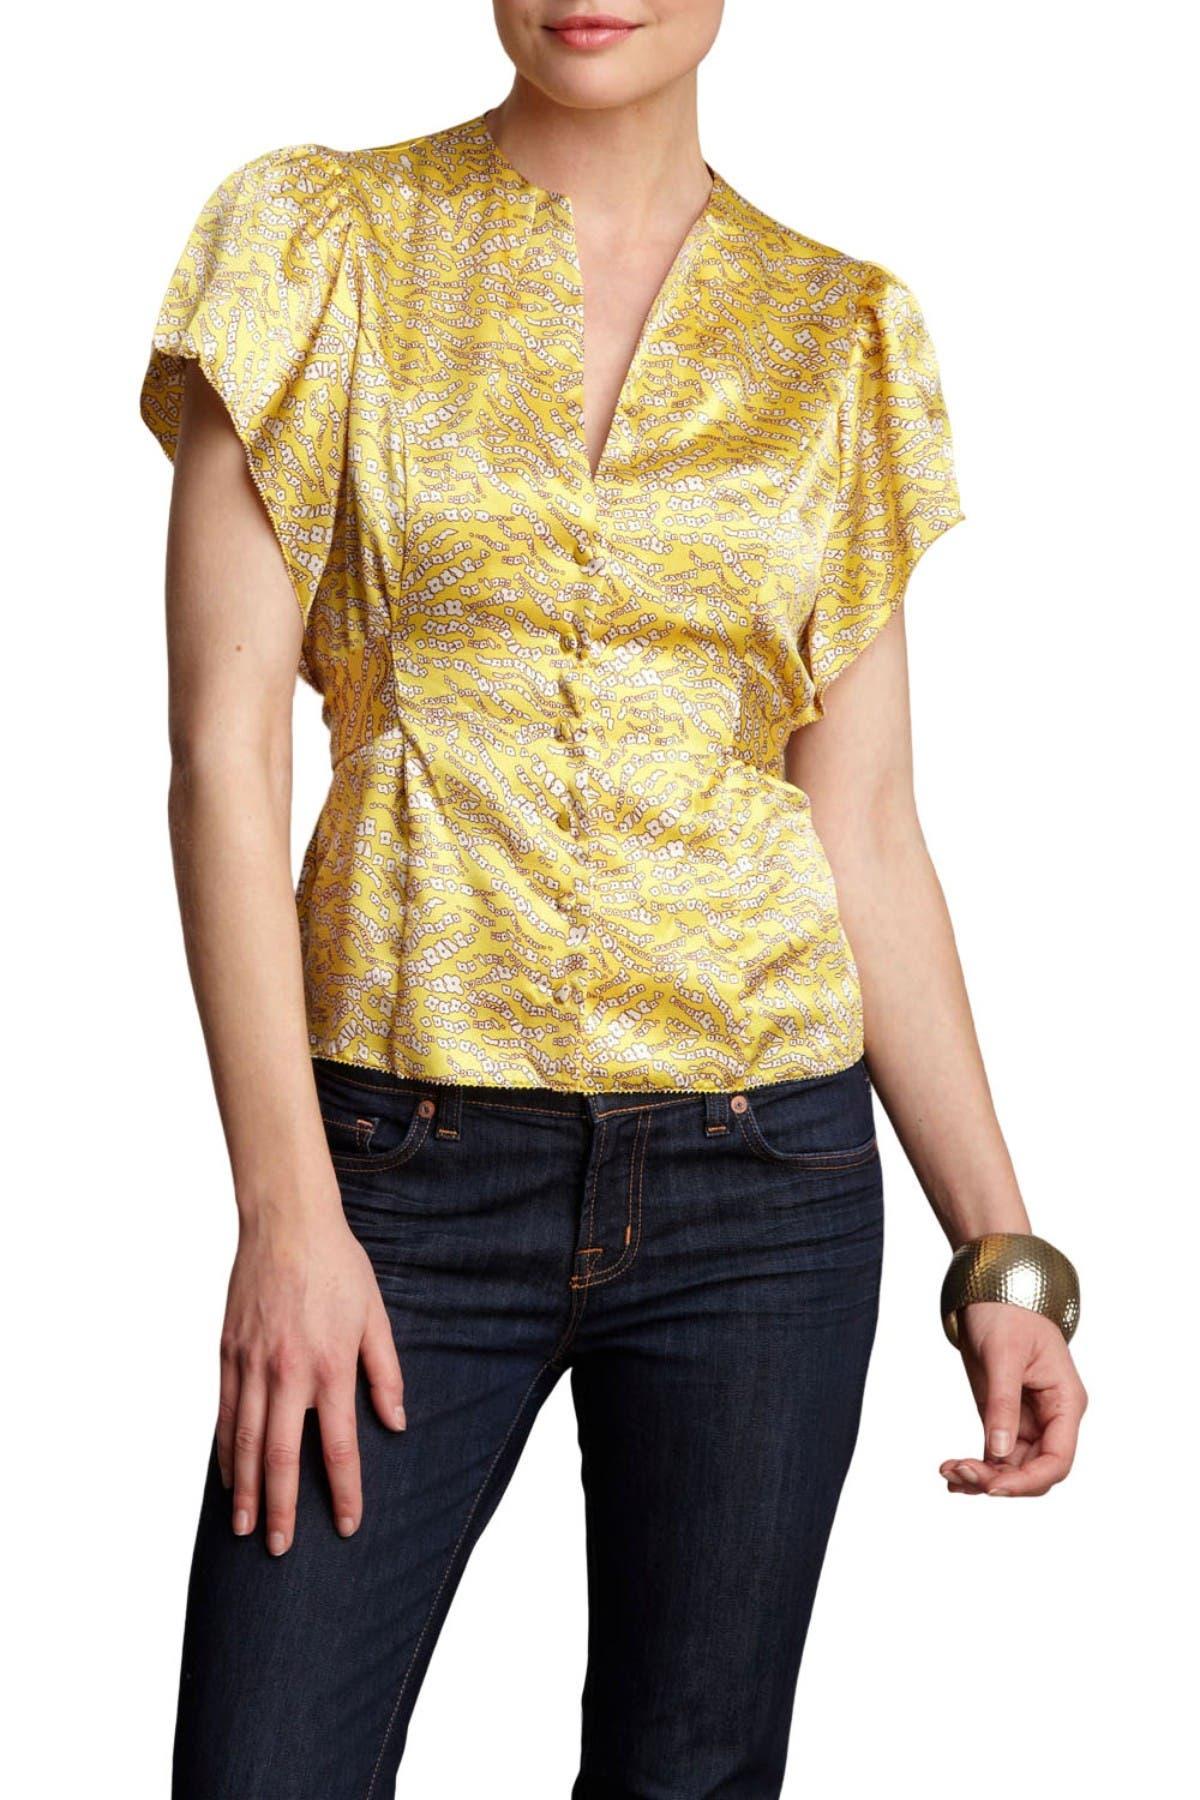 1930s Blouses, Tops, Shirt Styles | History Vertigo Printed Flutter Sleeve Satin Blouse - Ribbon Floral at Nordstrom Rack $19.97 AT vintagedancer.com